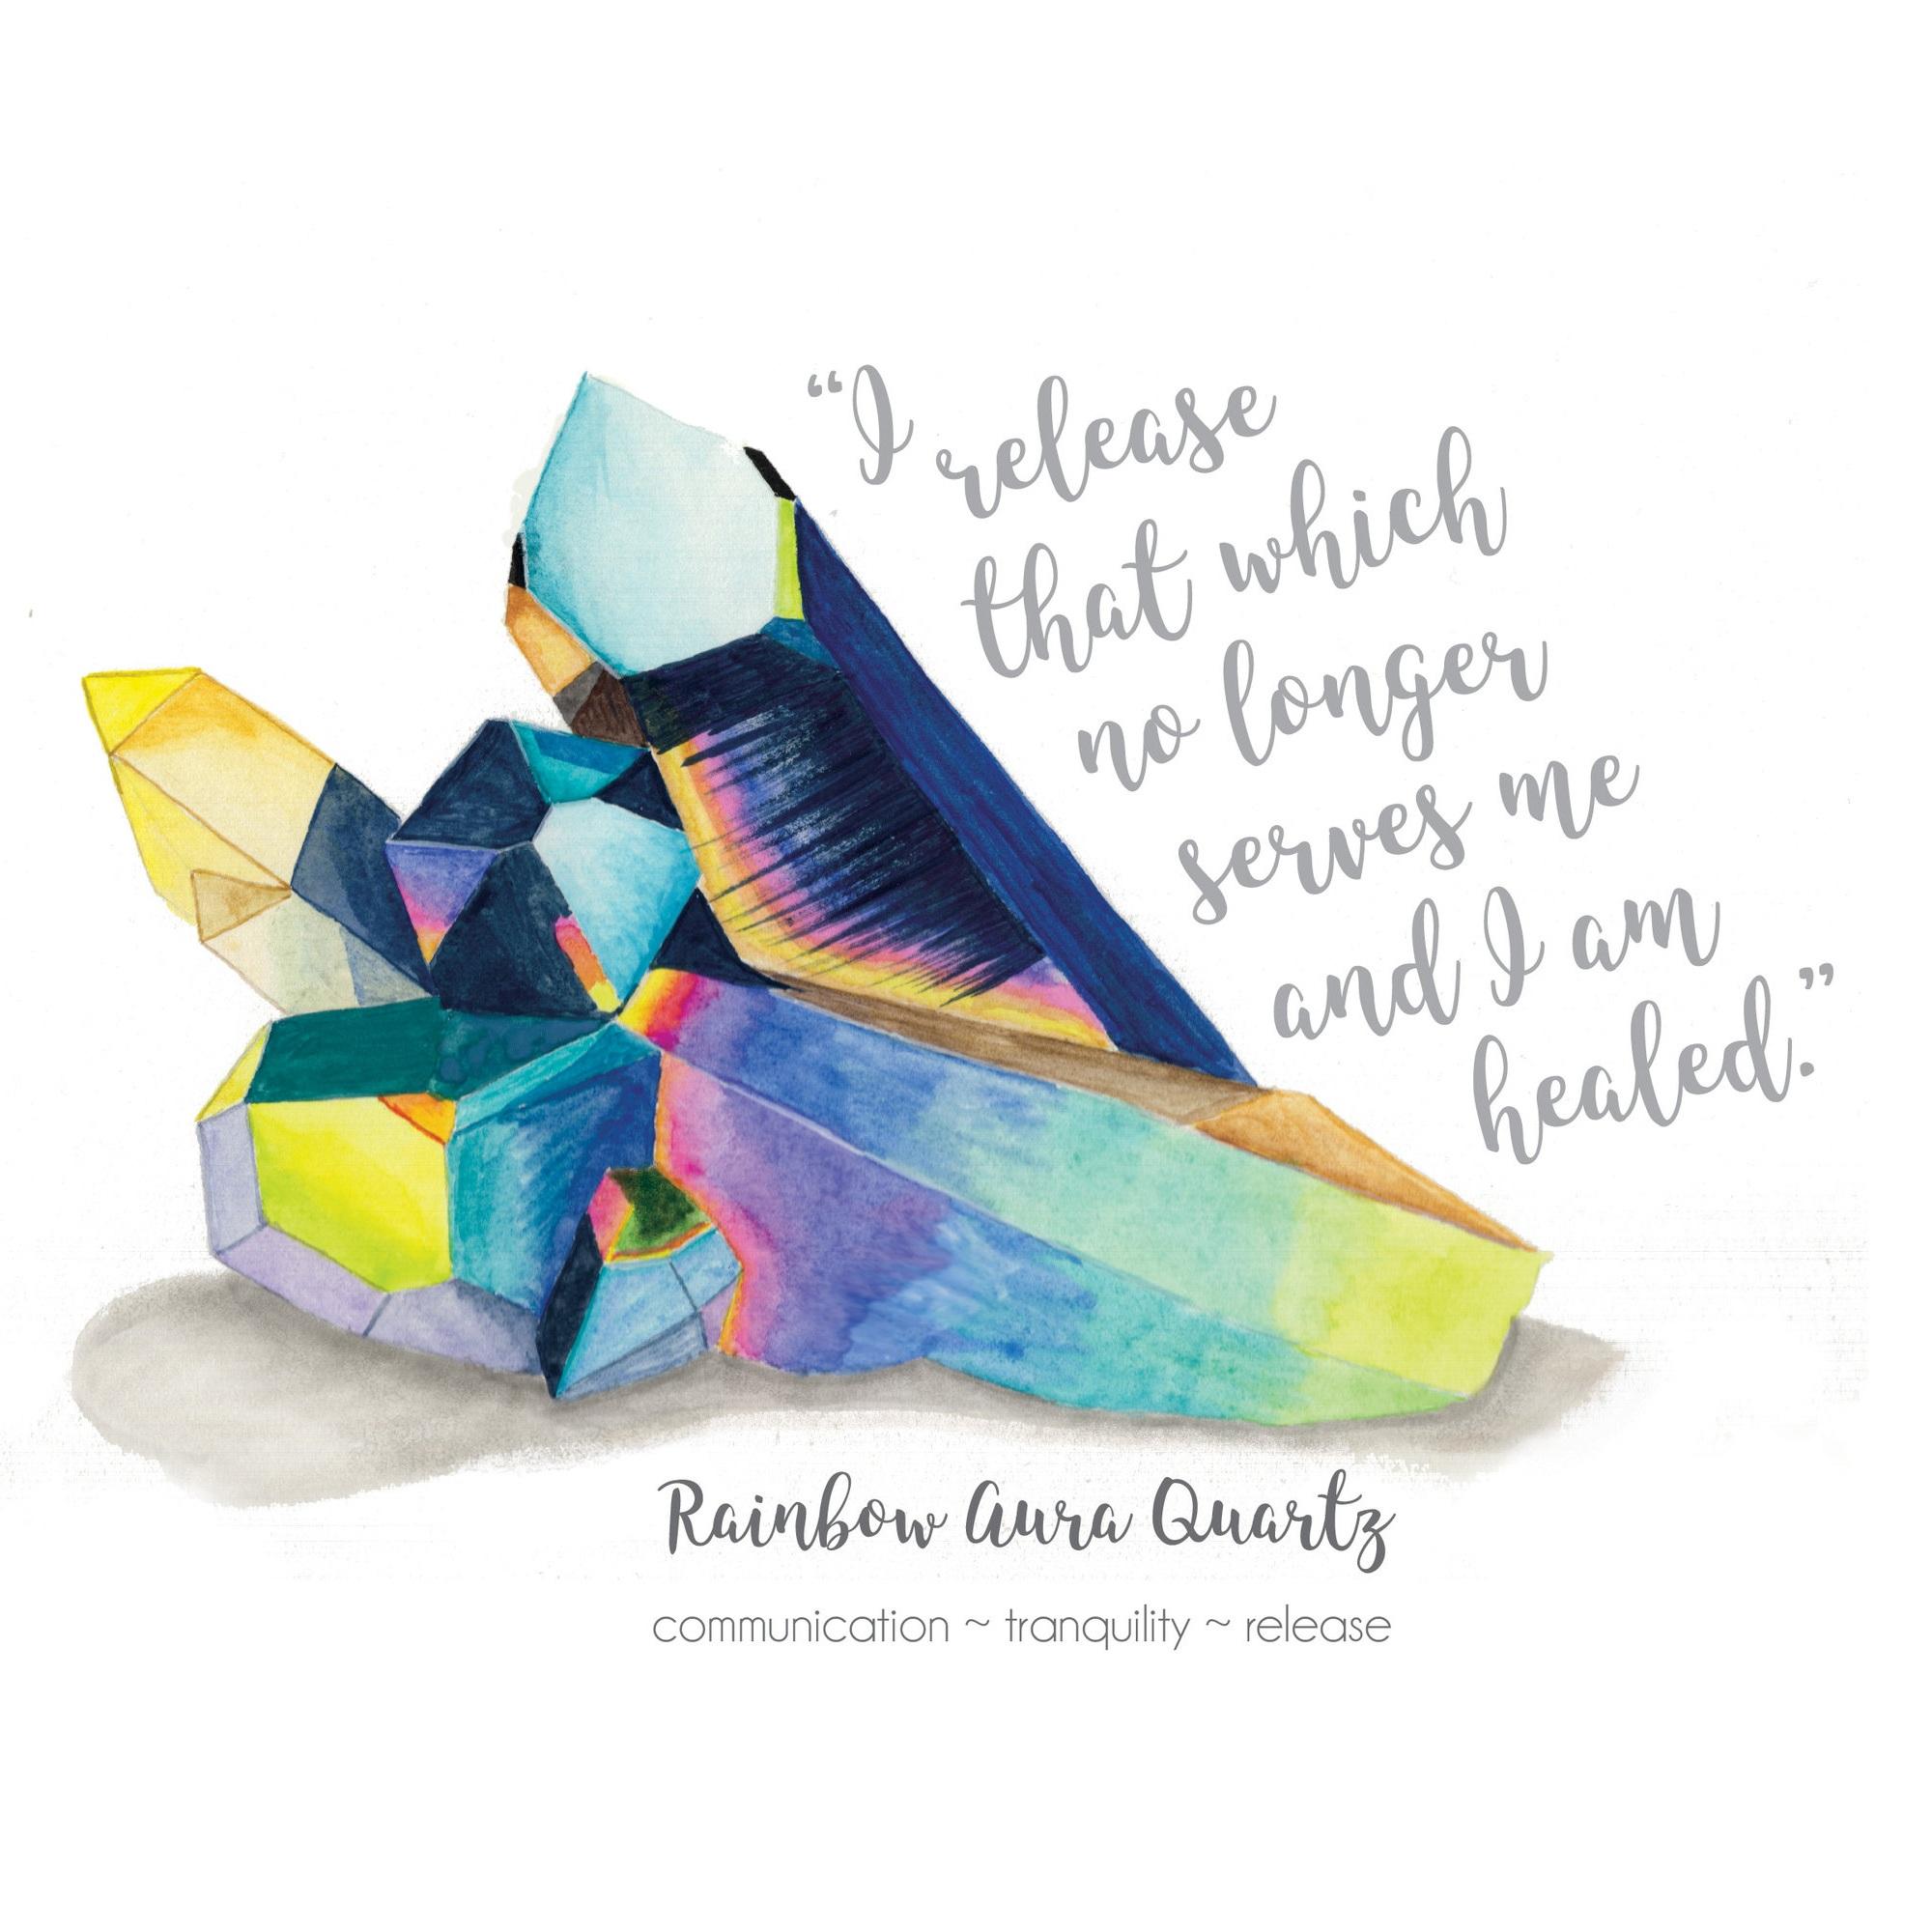 Rainbow+Aura+Quartz-01-01.jpg